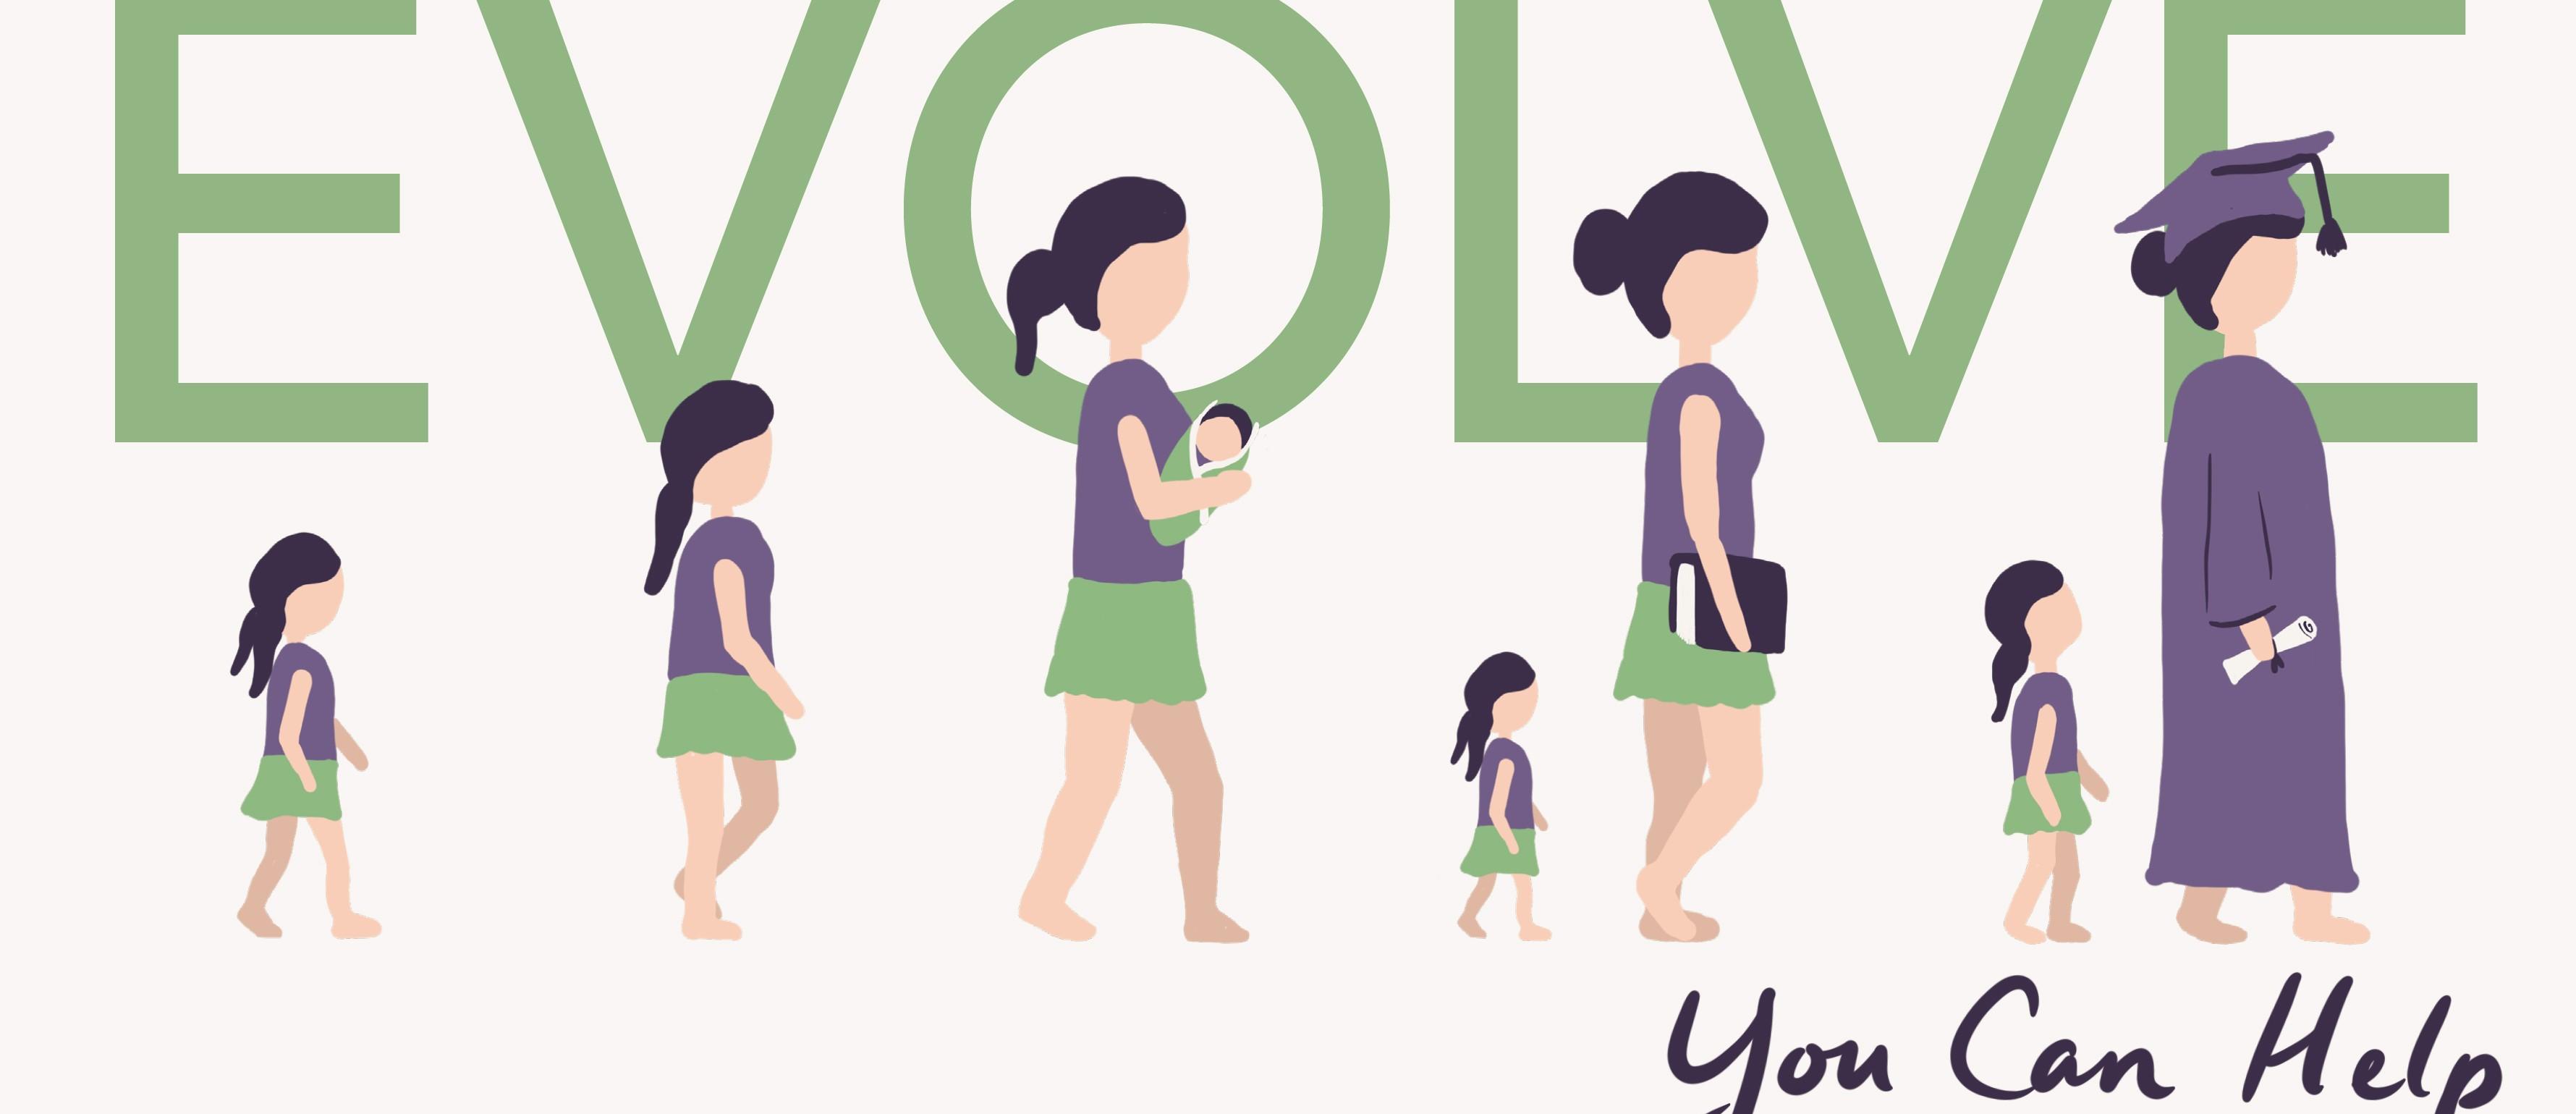 Women Helping Women poster